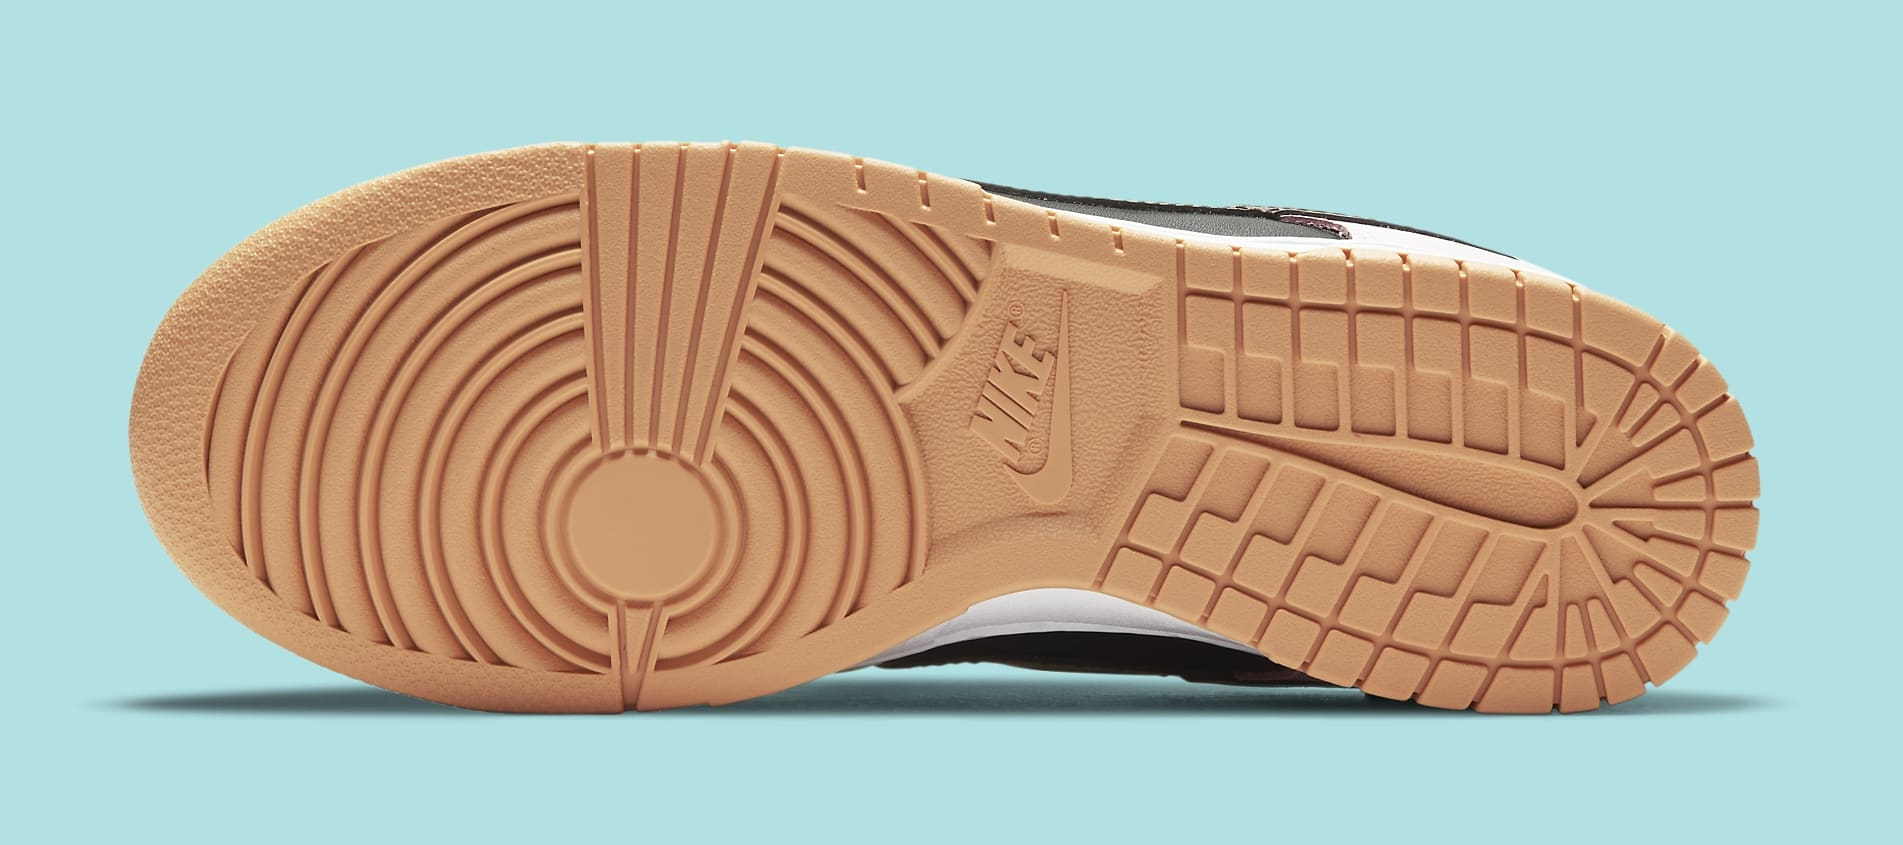 Nike Dunk Low 'Free.99' Black DH0952-001 Outsole